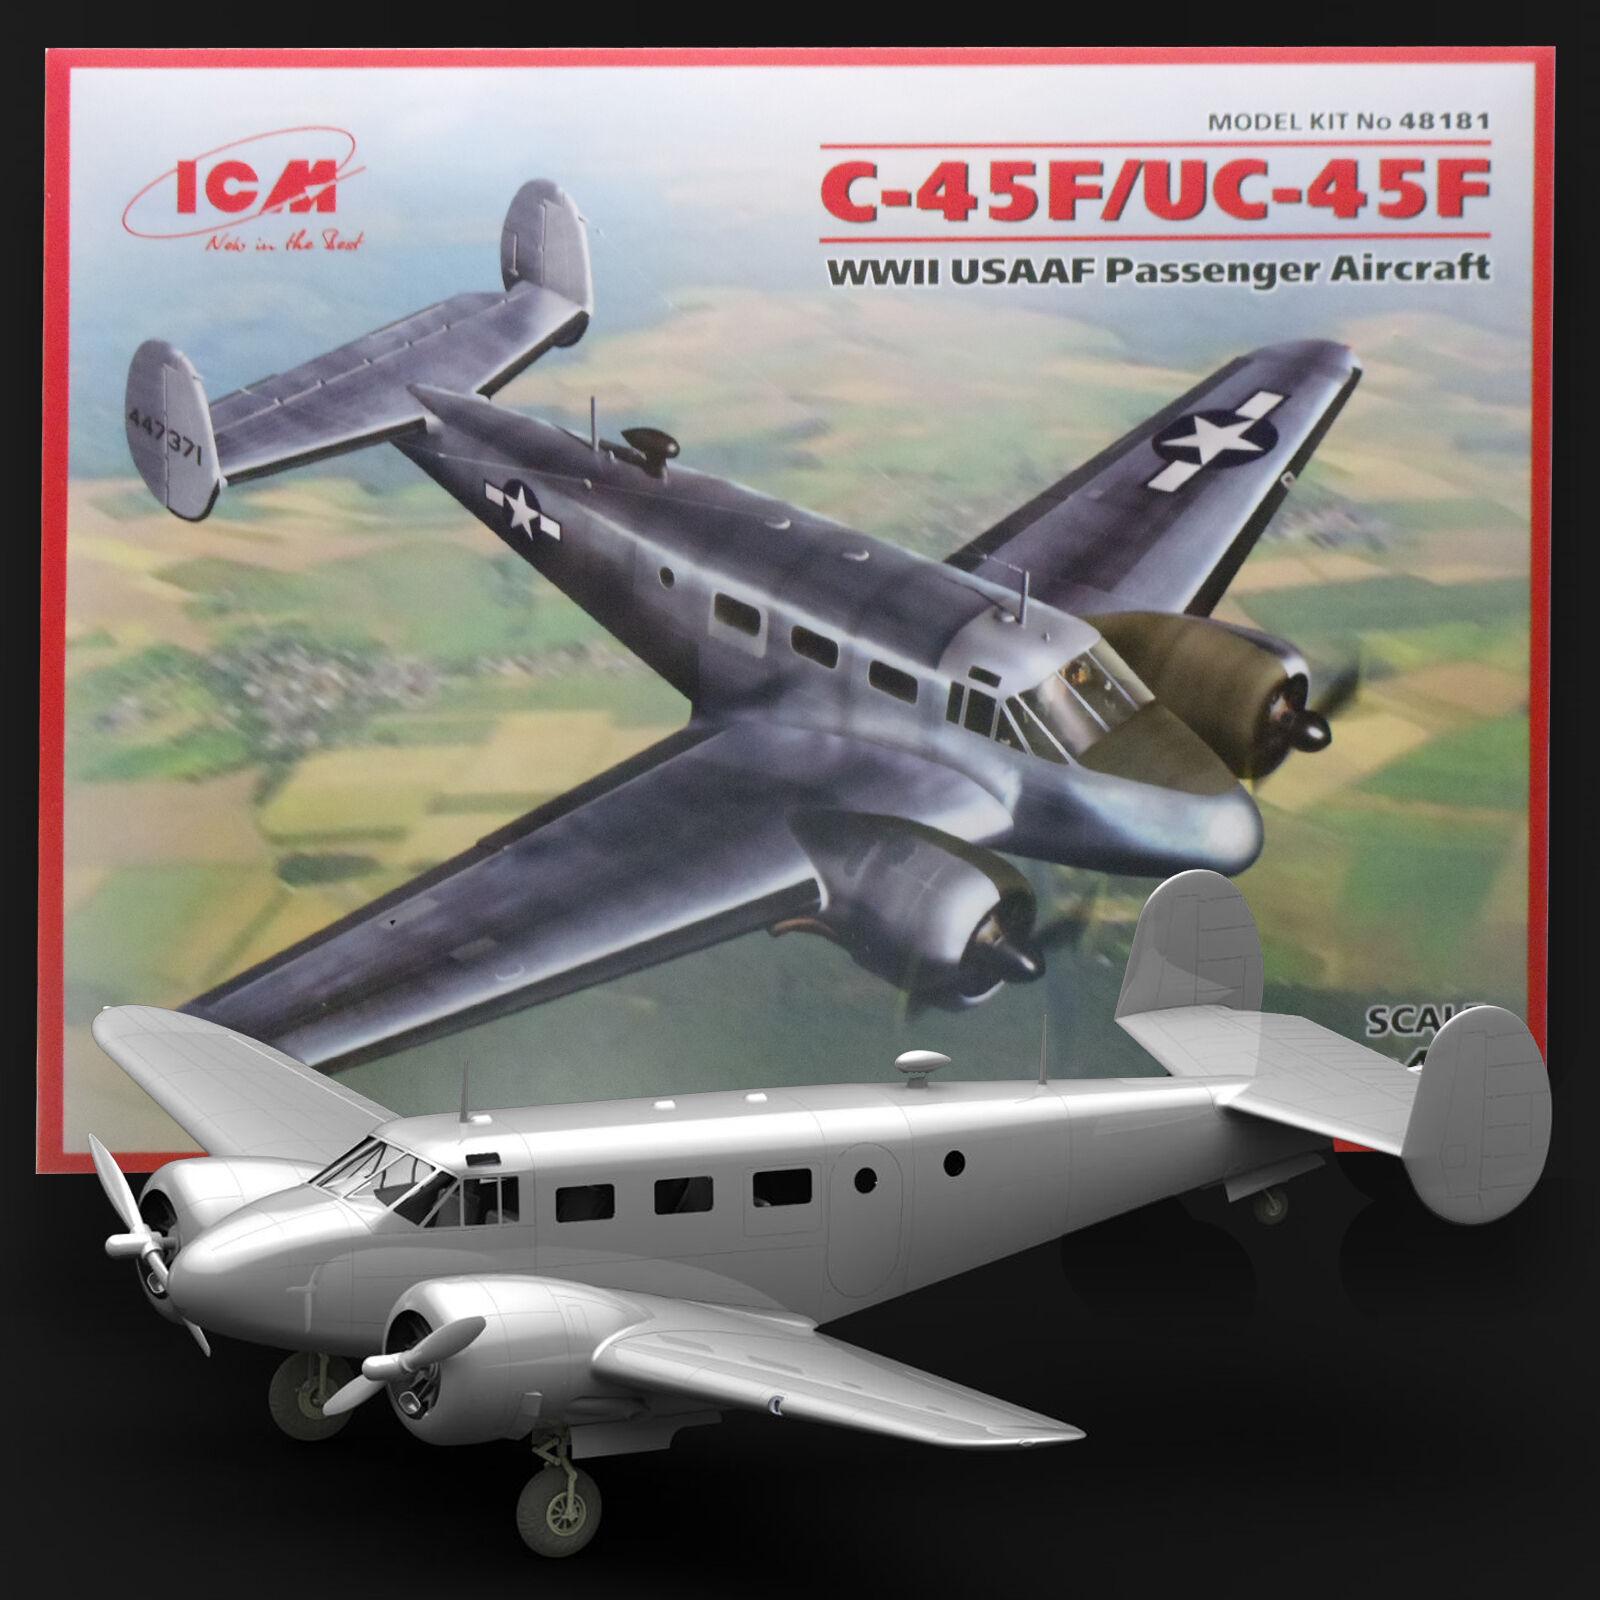 ICM 1 48 BEECHCRAFT C-45F USAAF EXPIDITER  UC45 US NAVY NAVIGATOR KIT